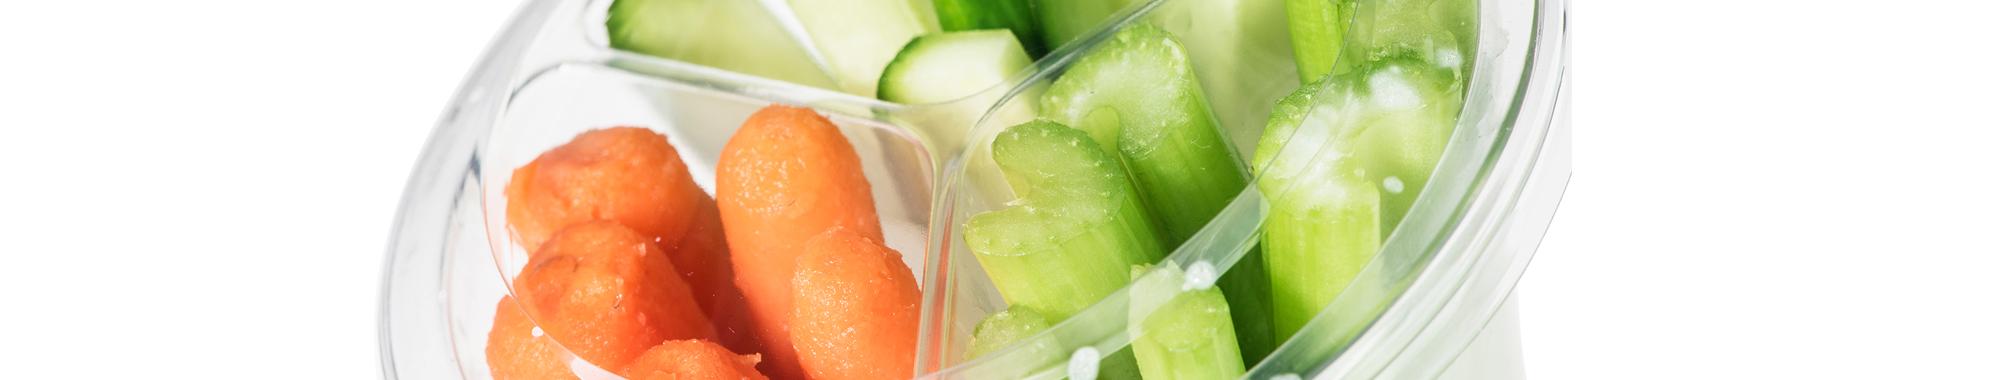 Header-3-vakstray-groente-2000x380px